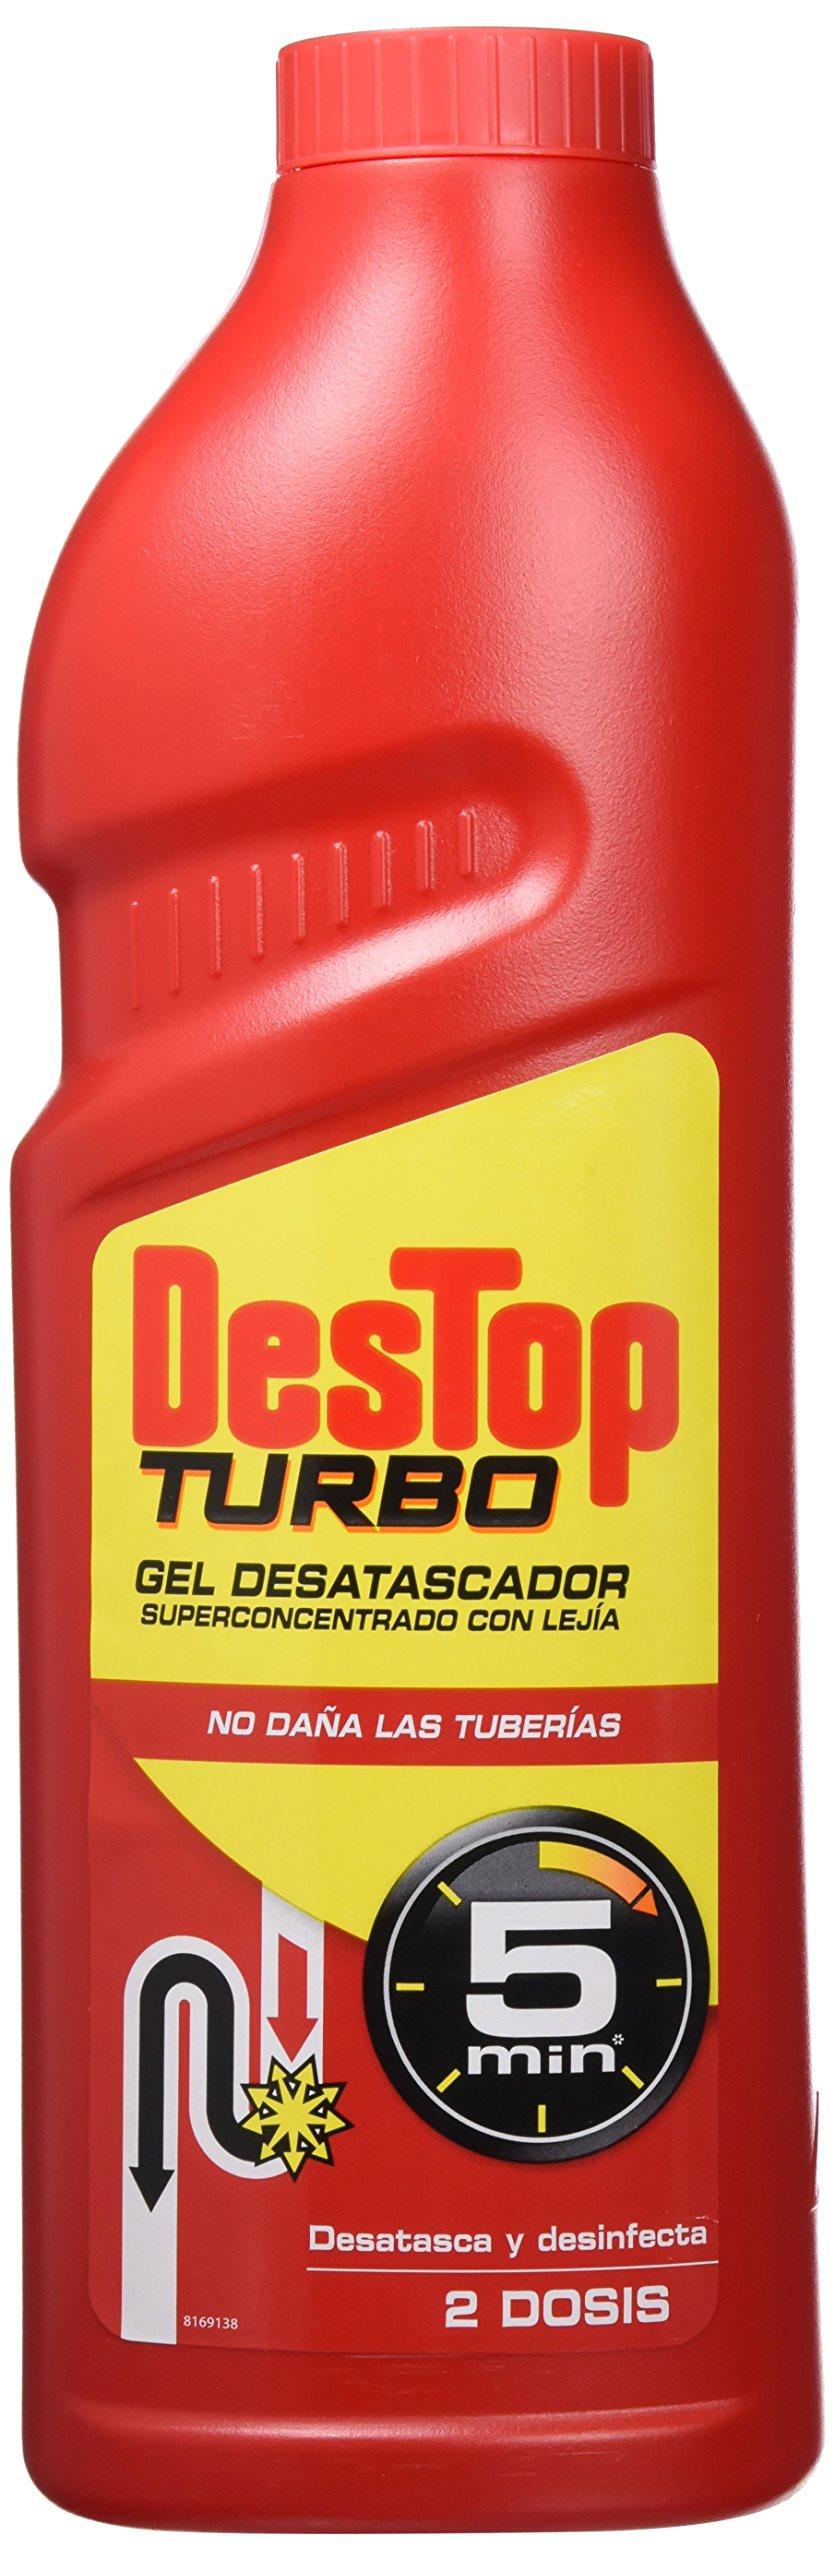 Destop Gel Turbo - 1 l product image